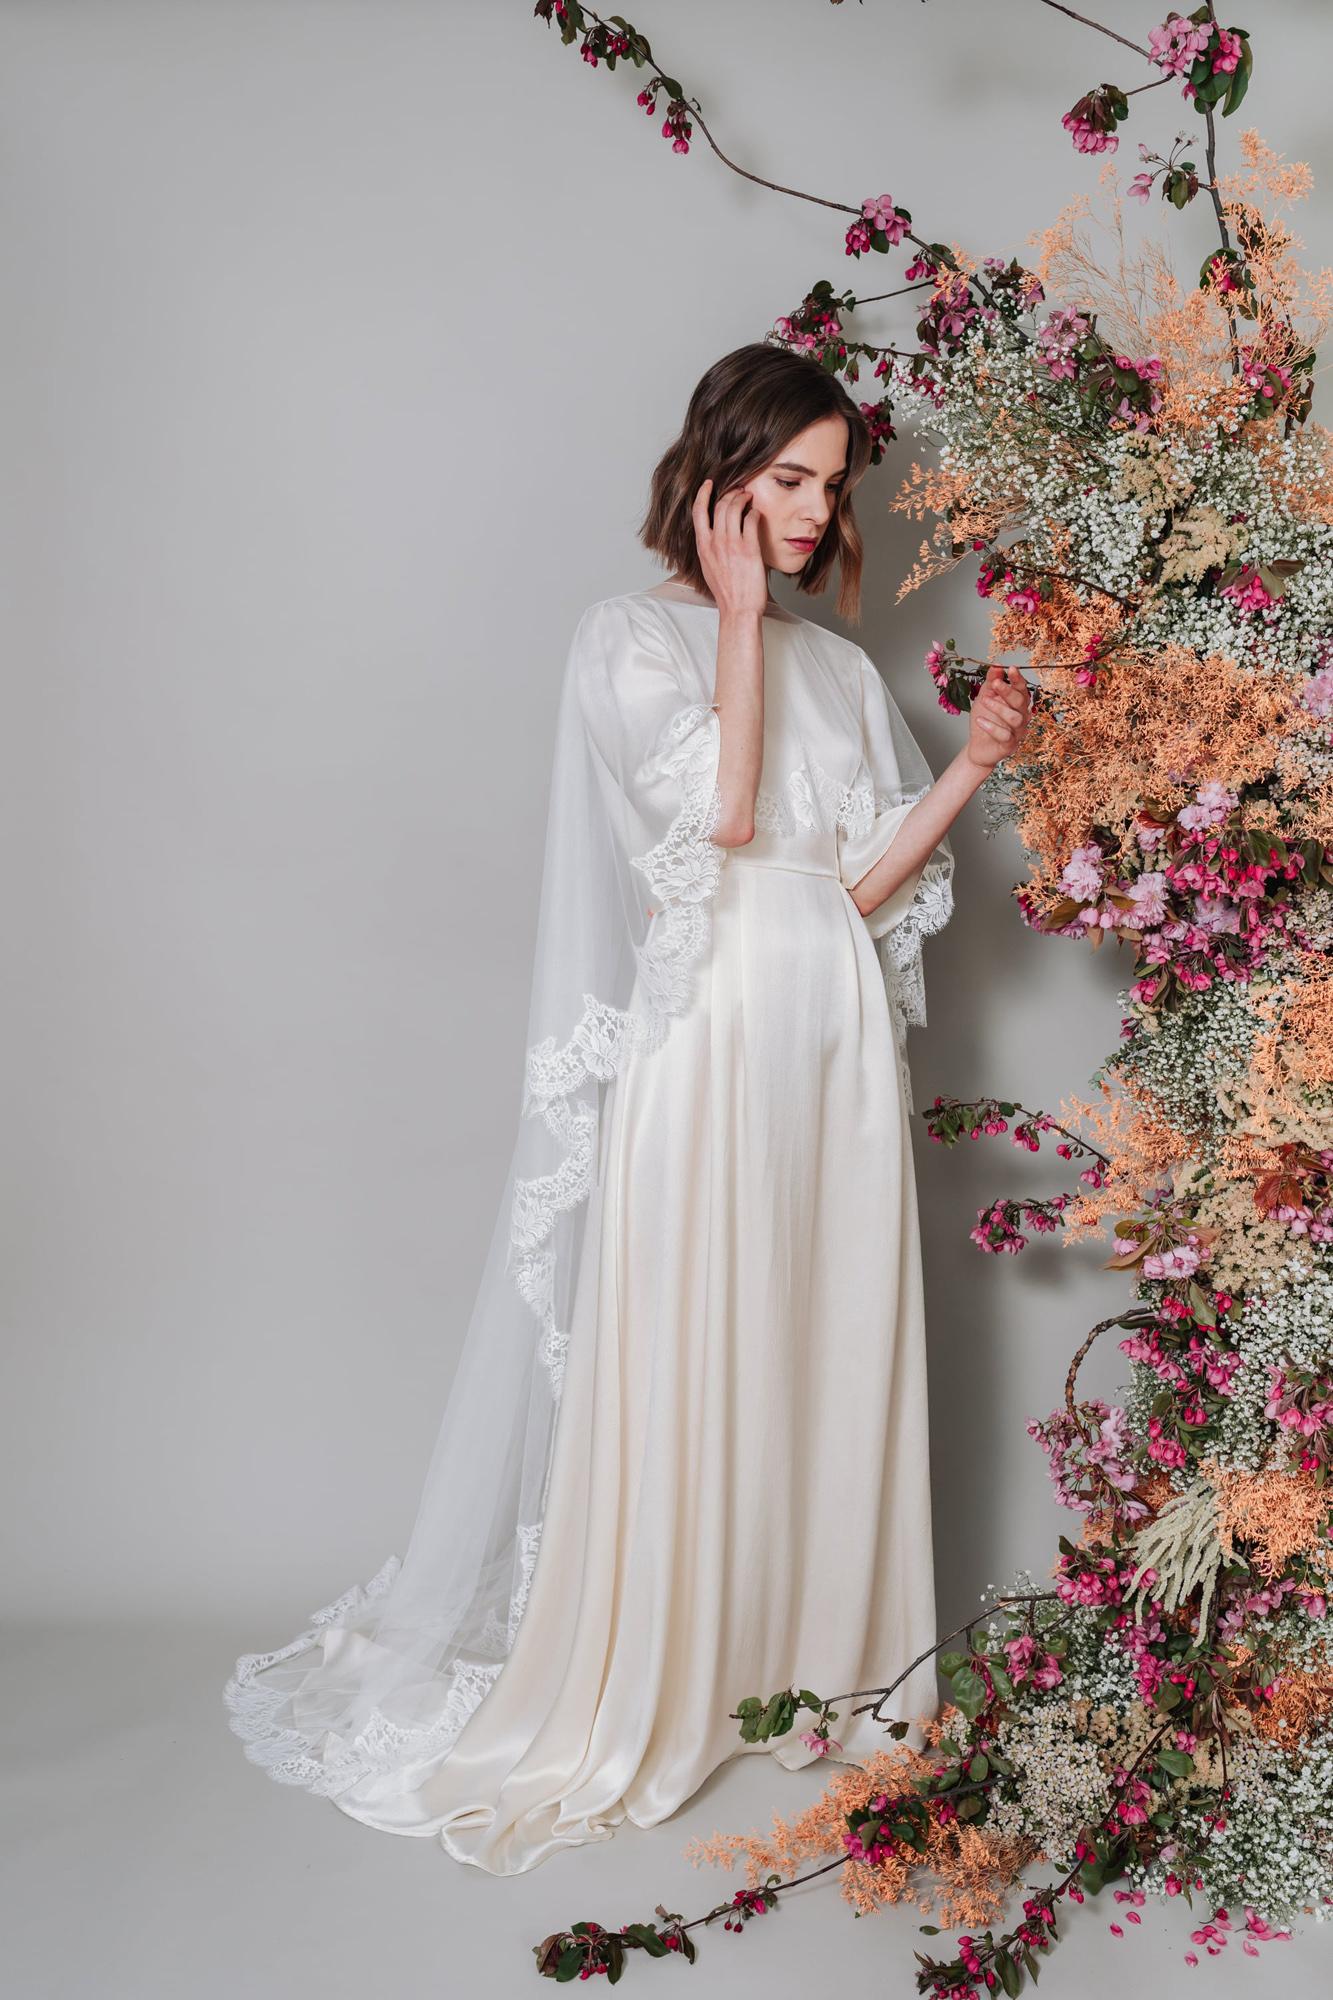 Kate-Beaumont-Lunaria-Bohemian-Hammered-Silk-Wedding-Dress-Sleeves-16.jpg